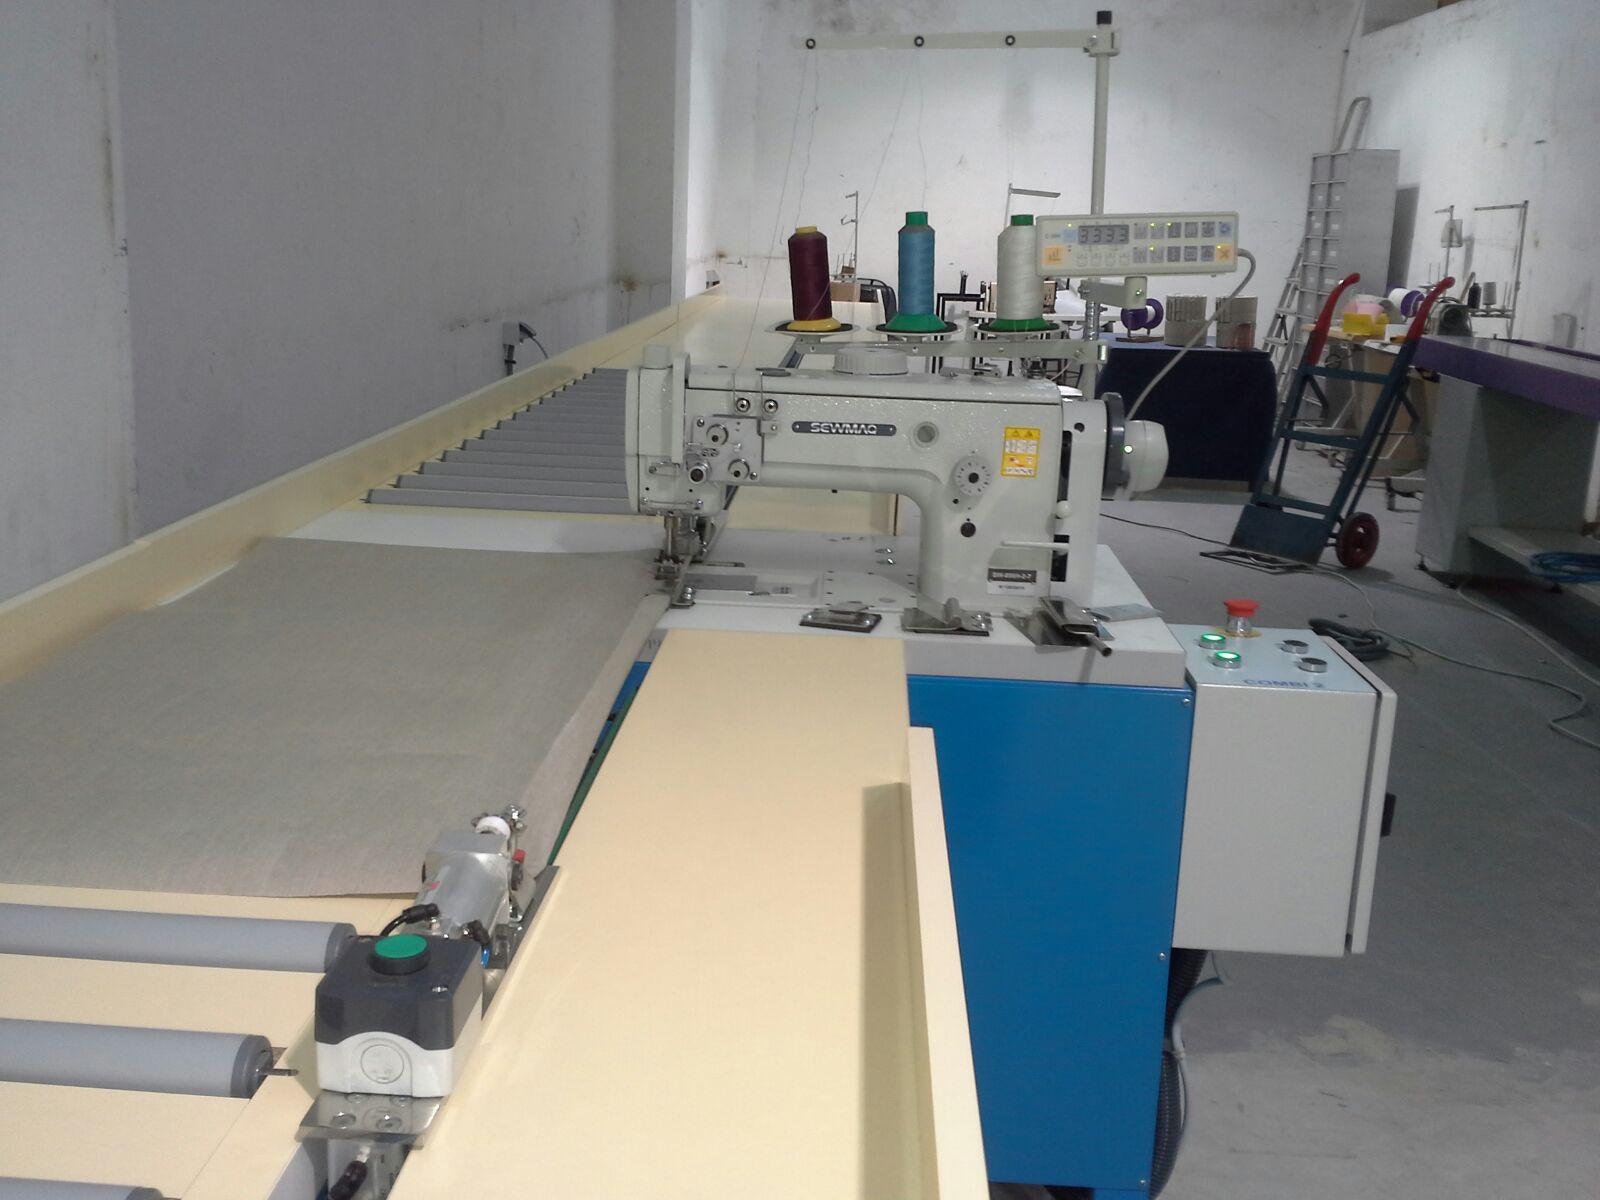 Guiatec guias para la confeccion guias para coser toldos for Maquinas para toldos enrollables